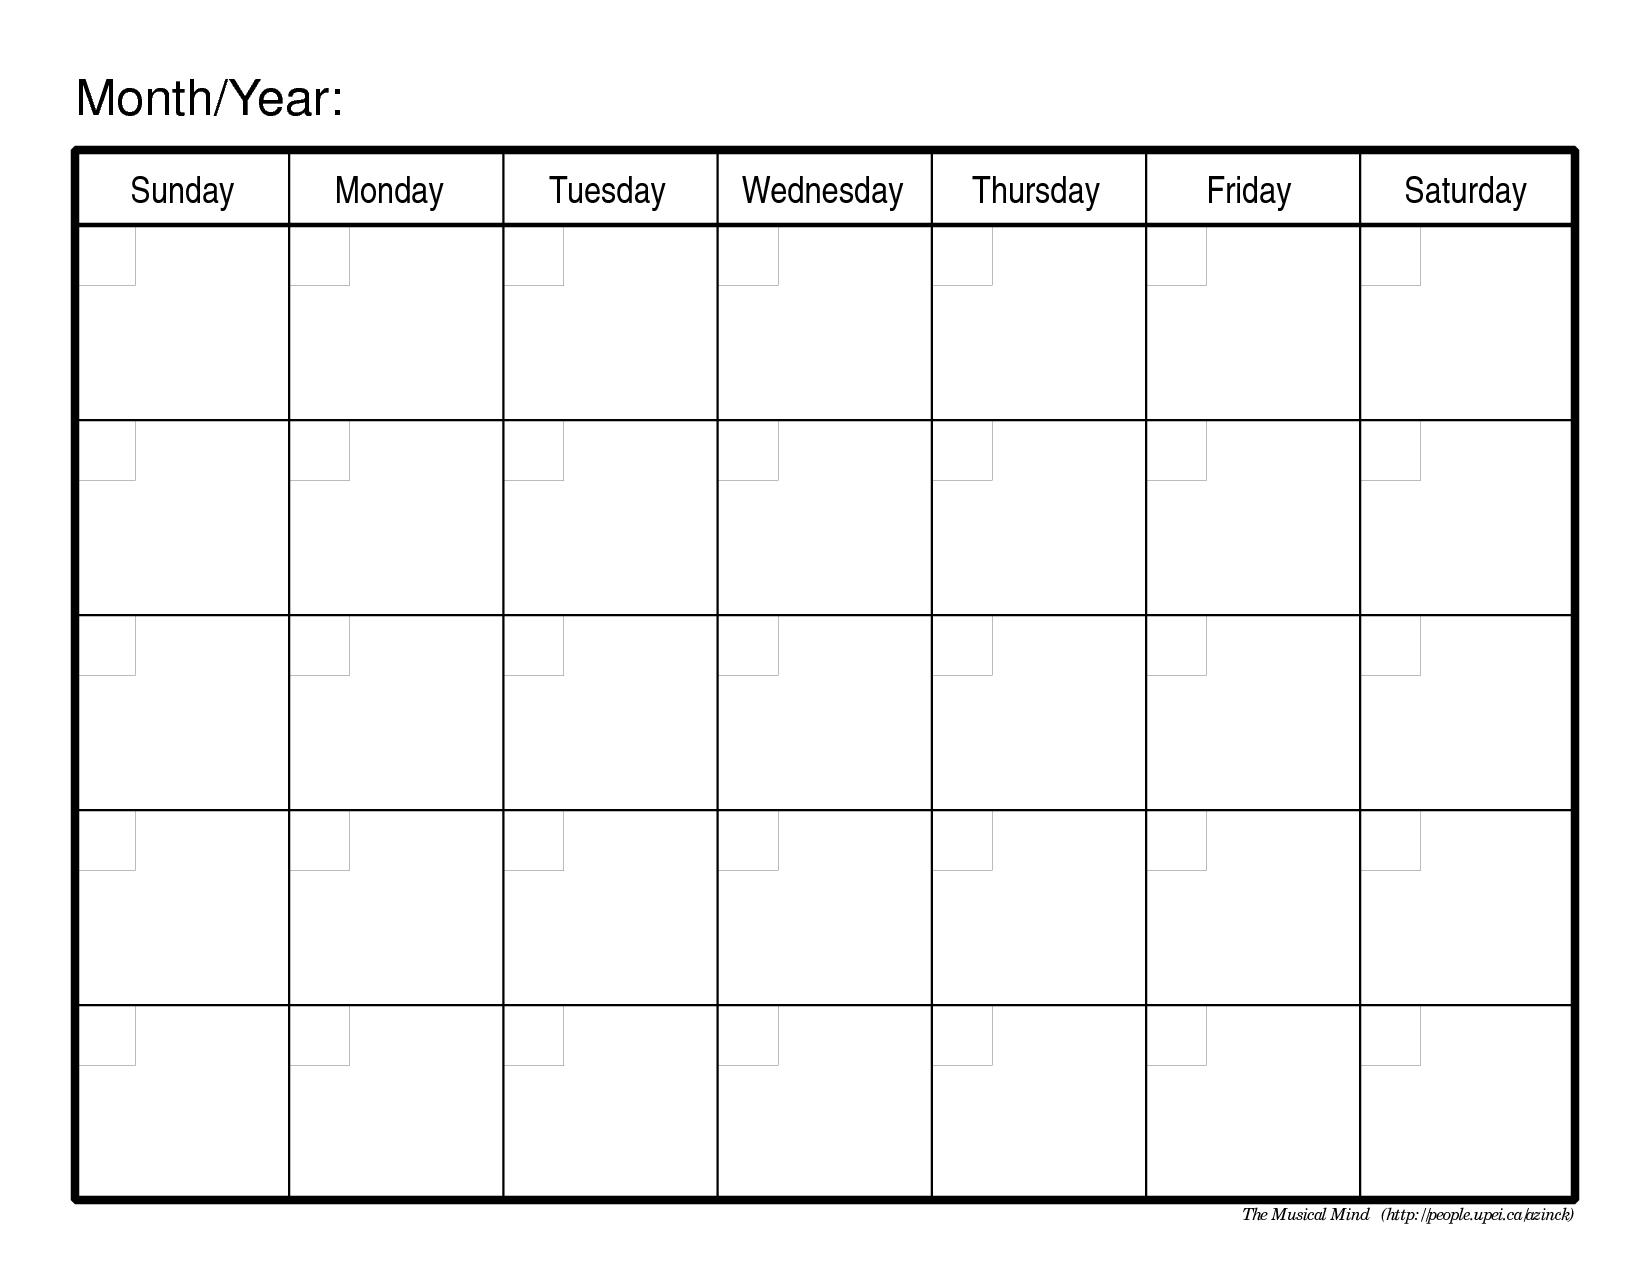 Monthly Calendar Template | Free Printable Calendar